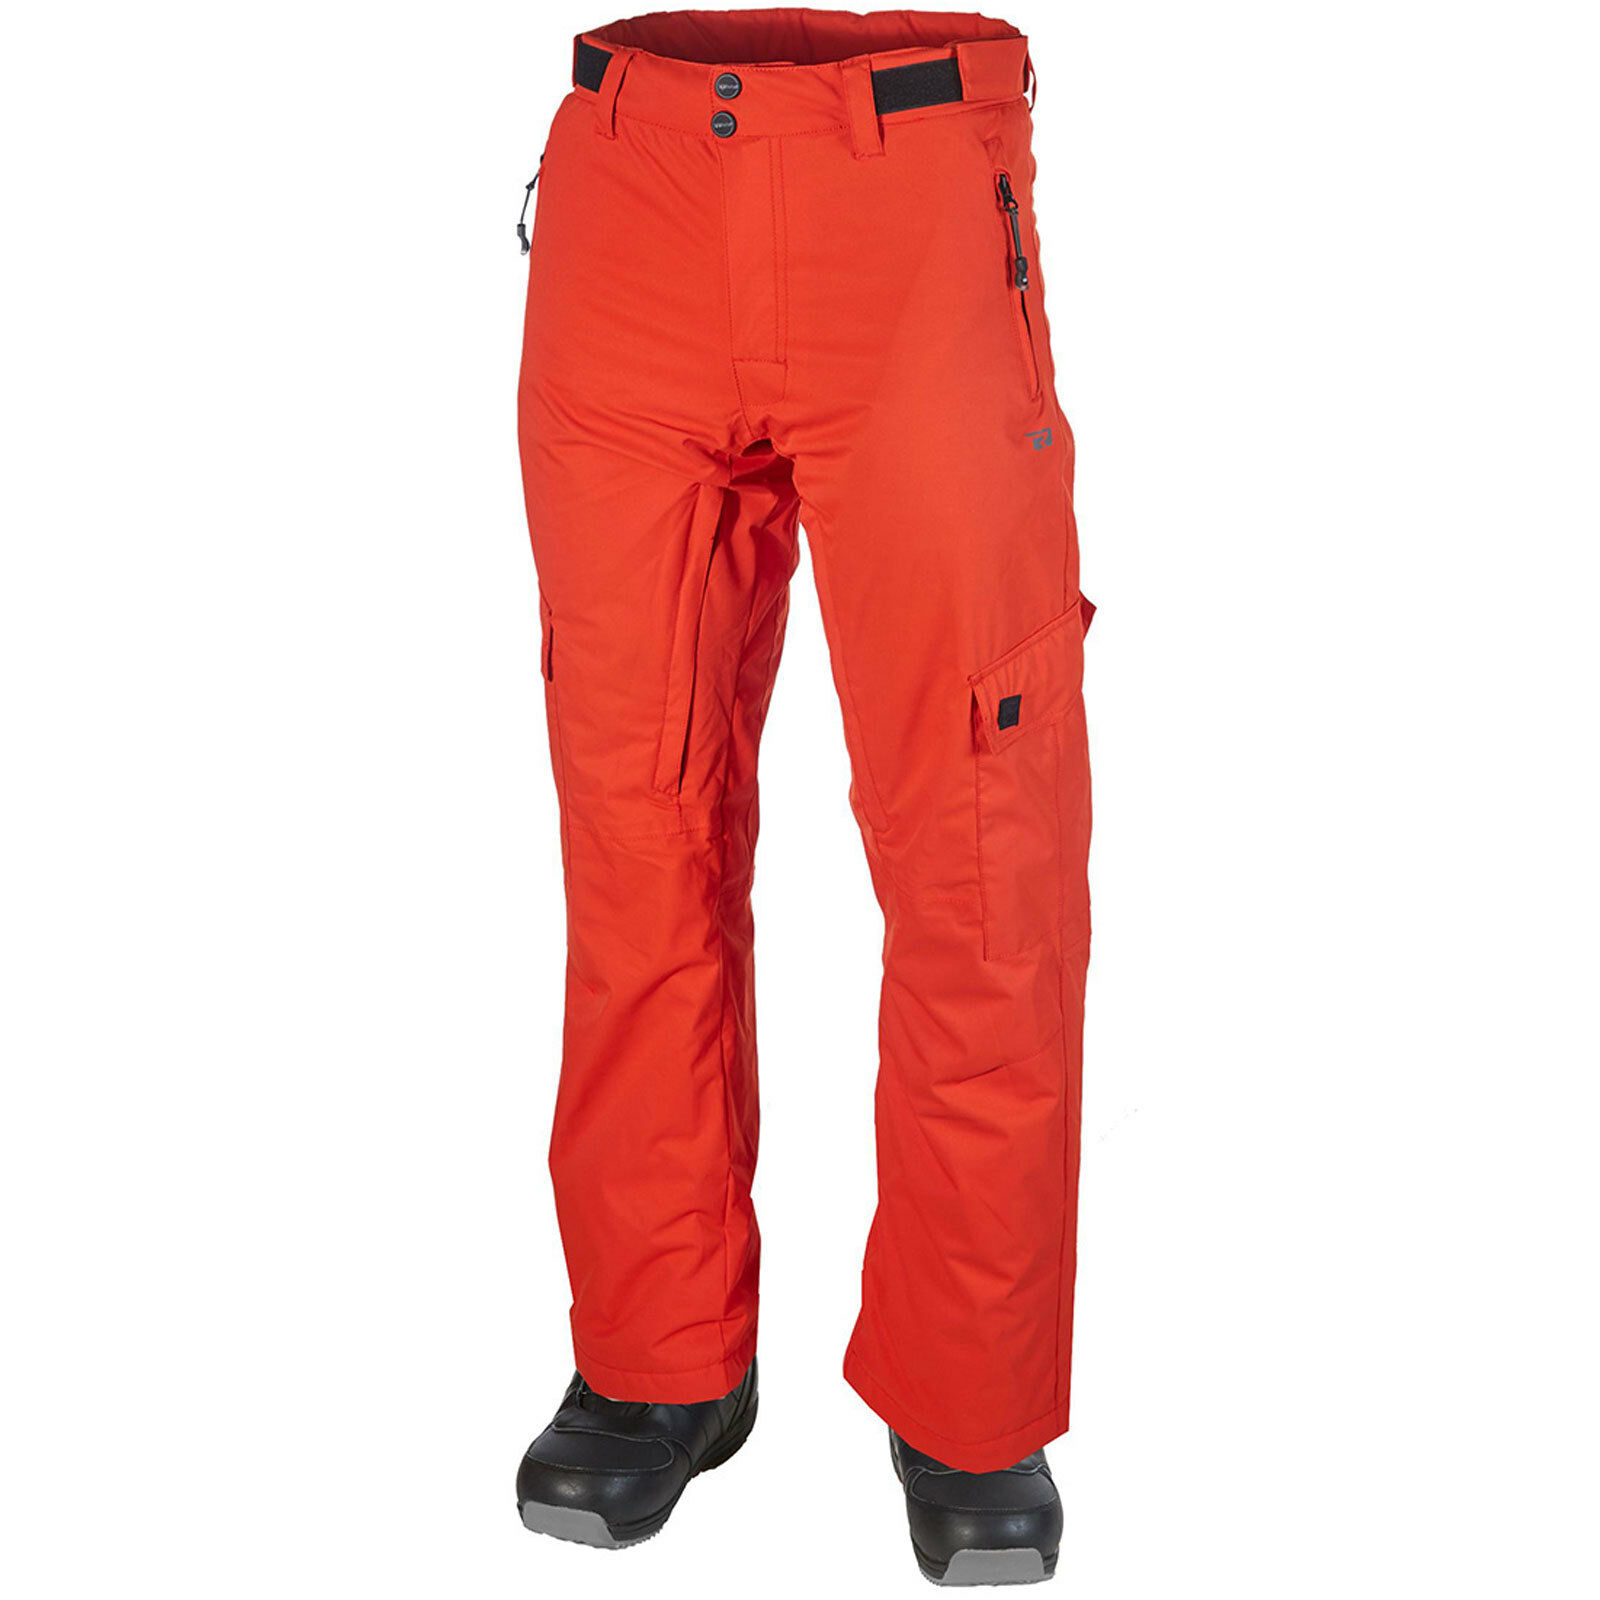 Rehall Rehall Rehall Dexter-R Herren Skihose Snowboardhose Funktionshose Winterhose NEU 304ae4